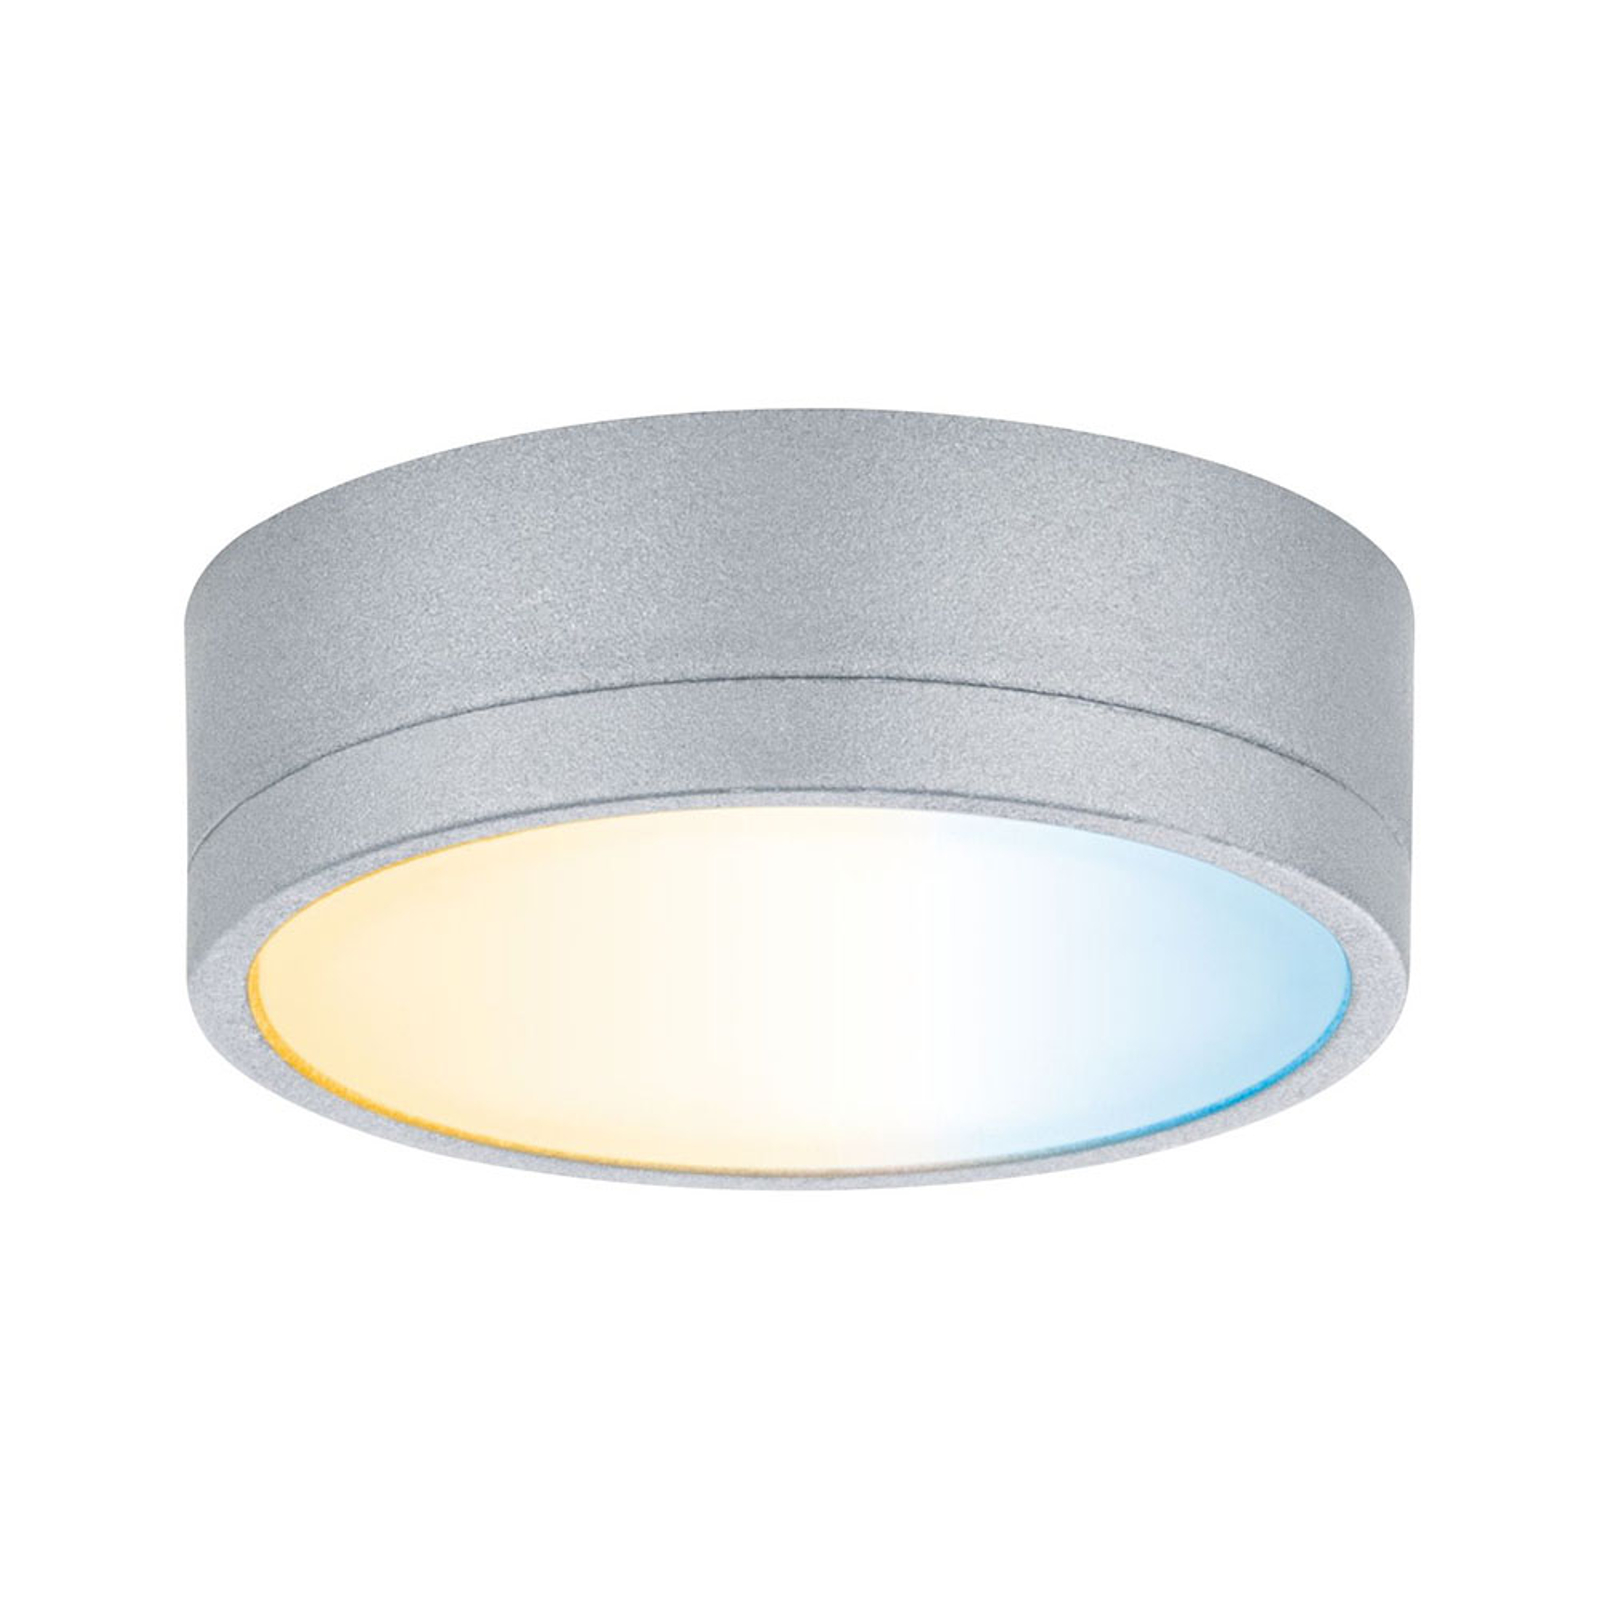 Paulmann Clever Connect Medal lampa do mebli chrom